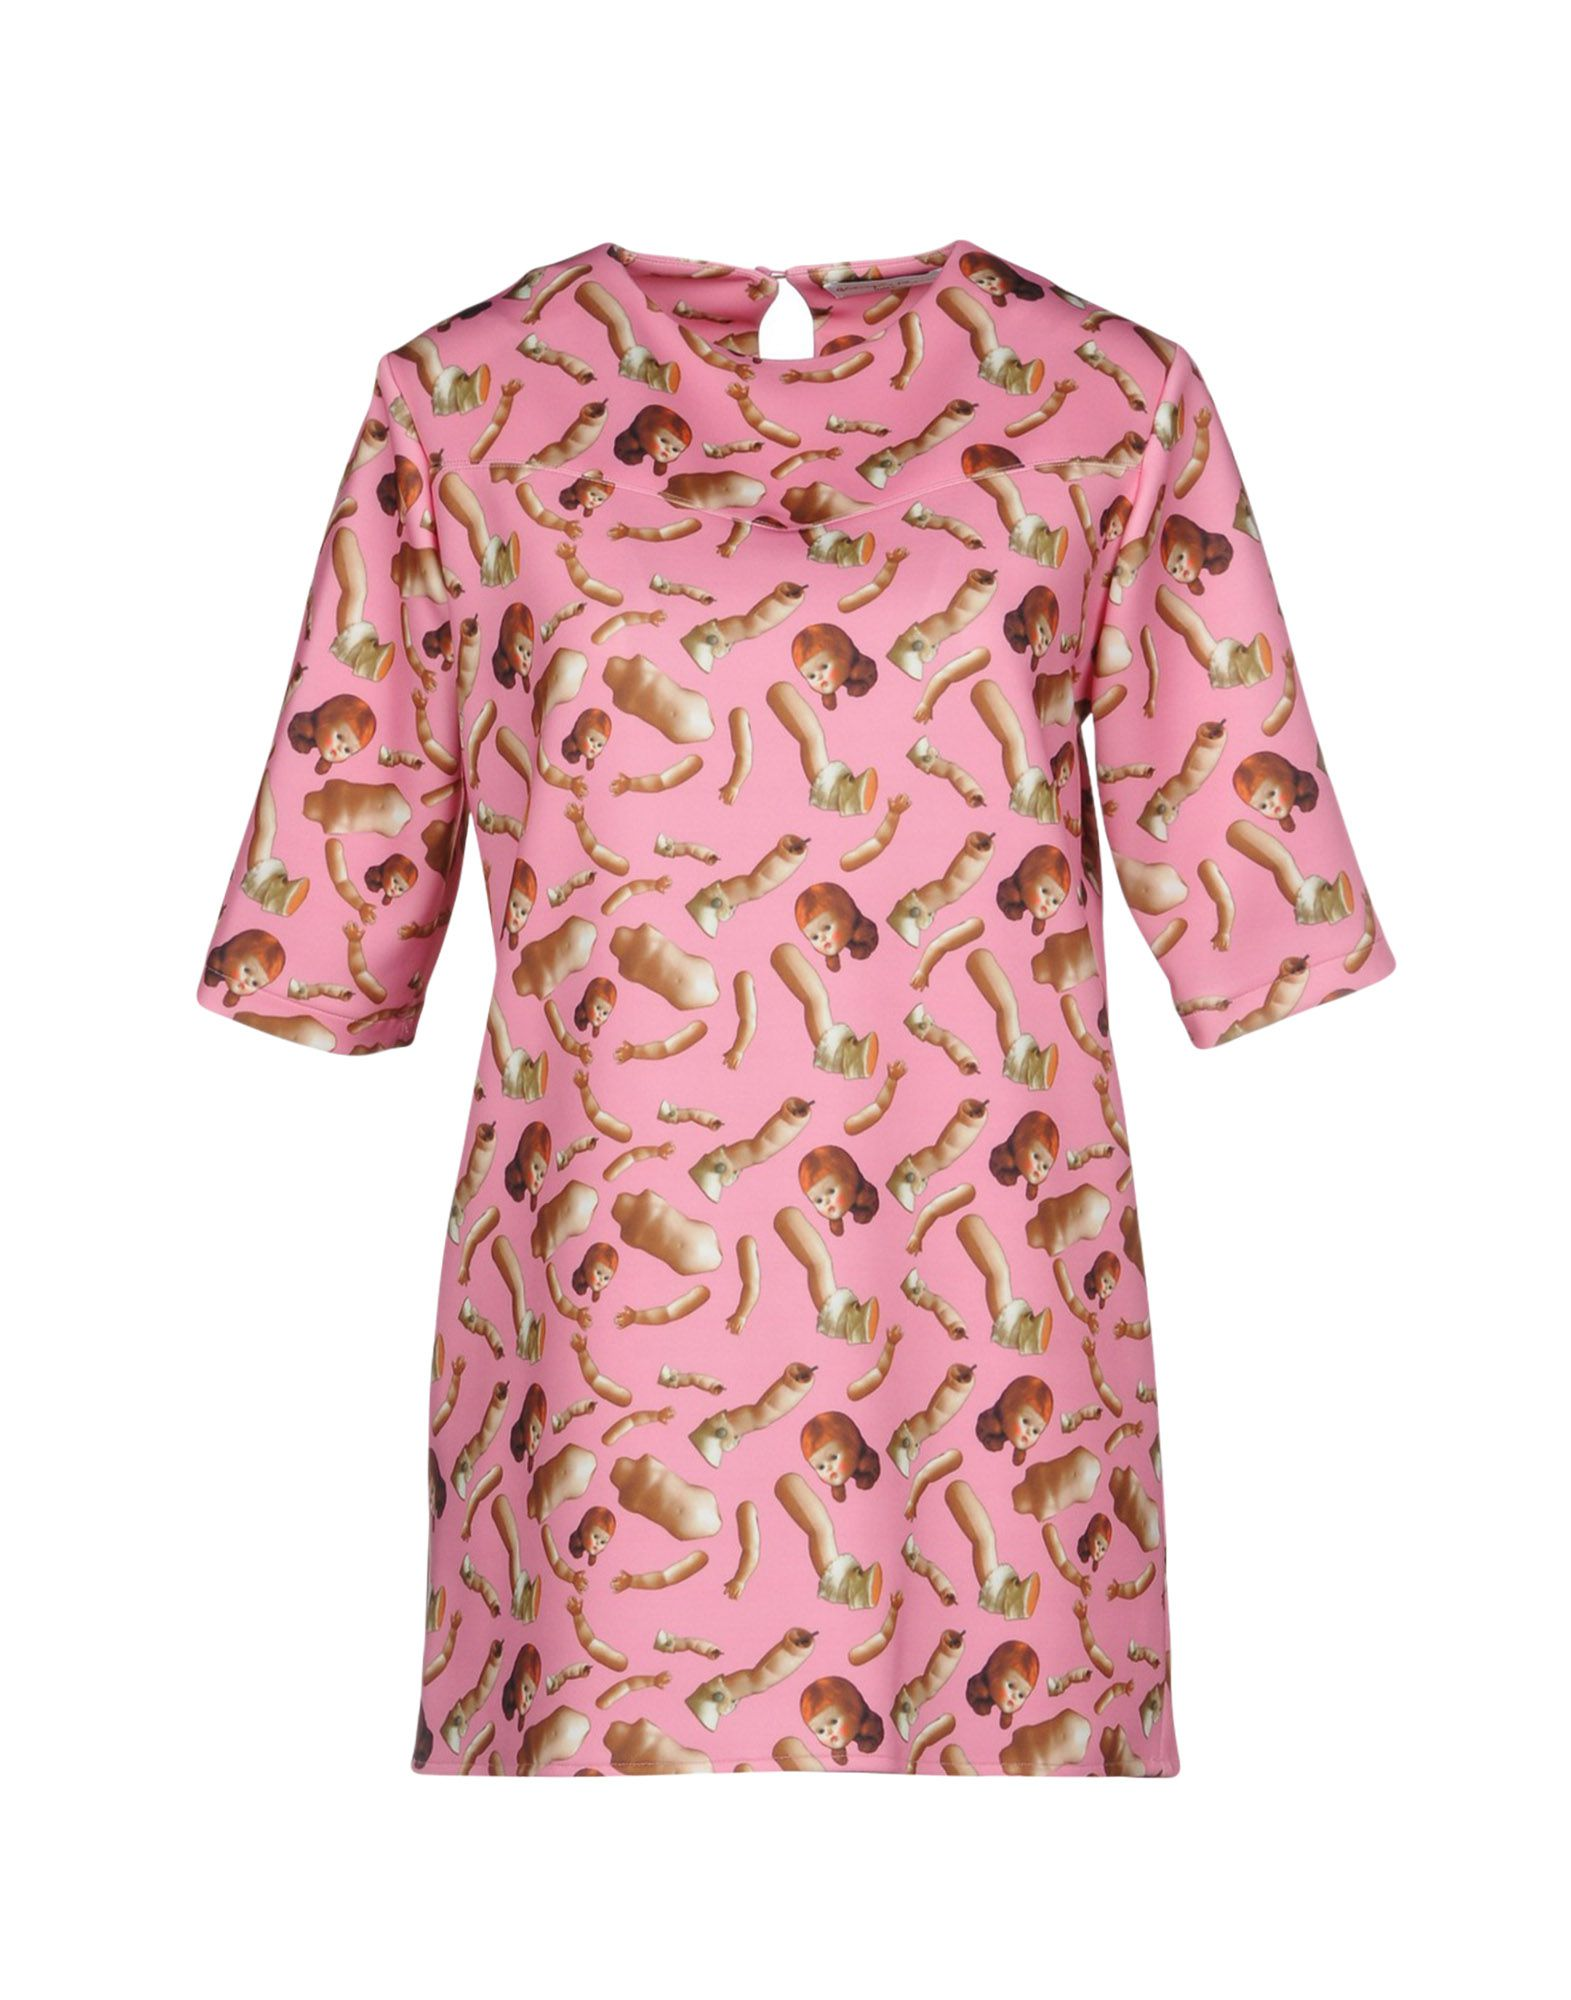 GIORGIA FIORE T-Shirt in Pink